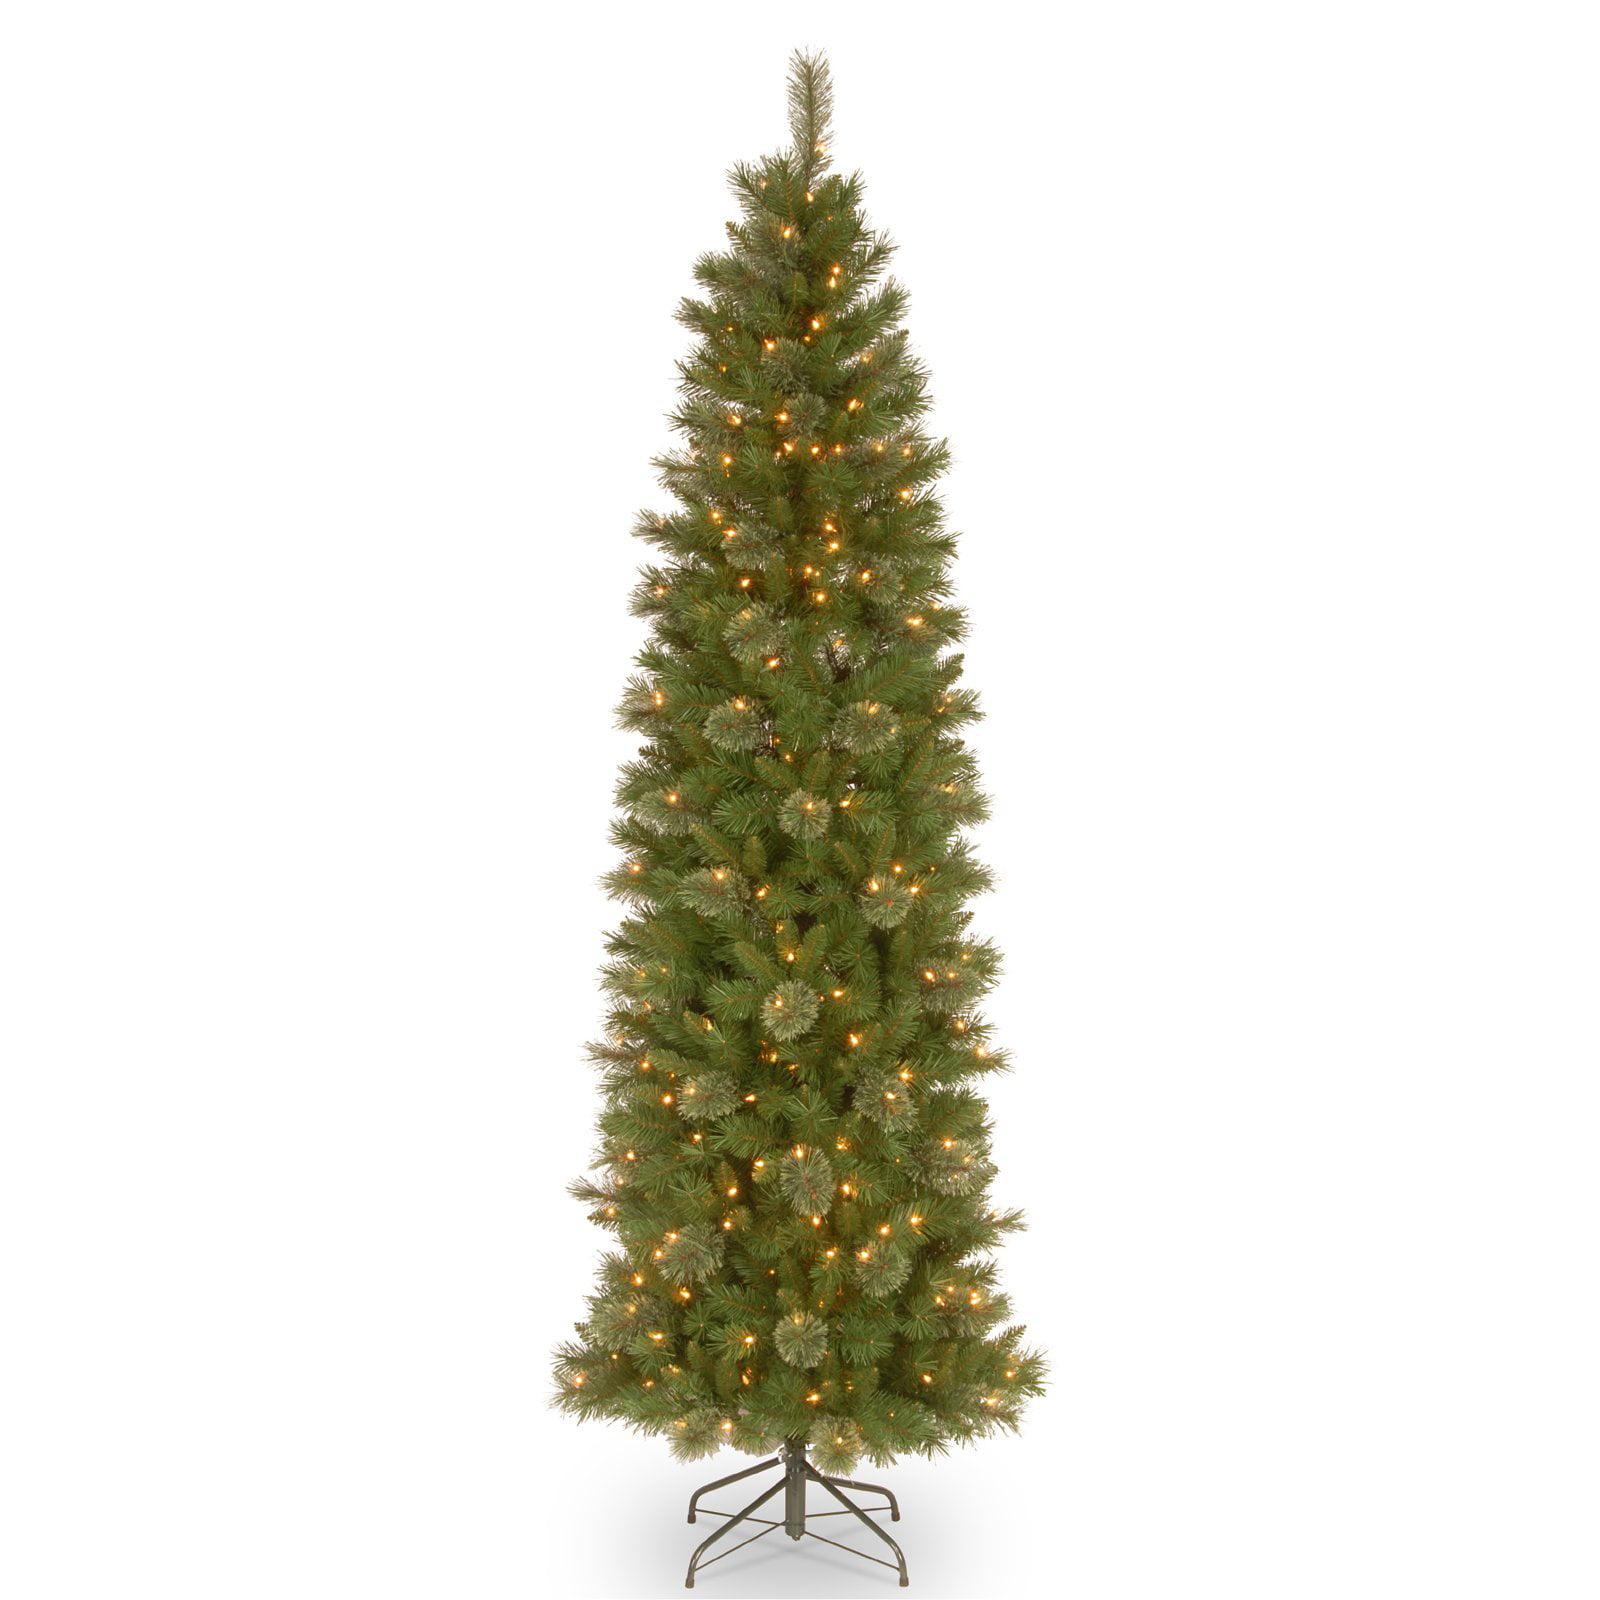 National Tree Company 6.5 ft. Tacoma Pine Pencil Slim Tree with Clear Lights